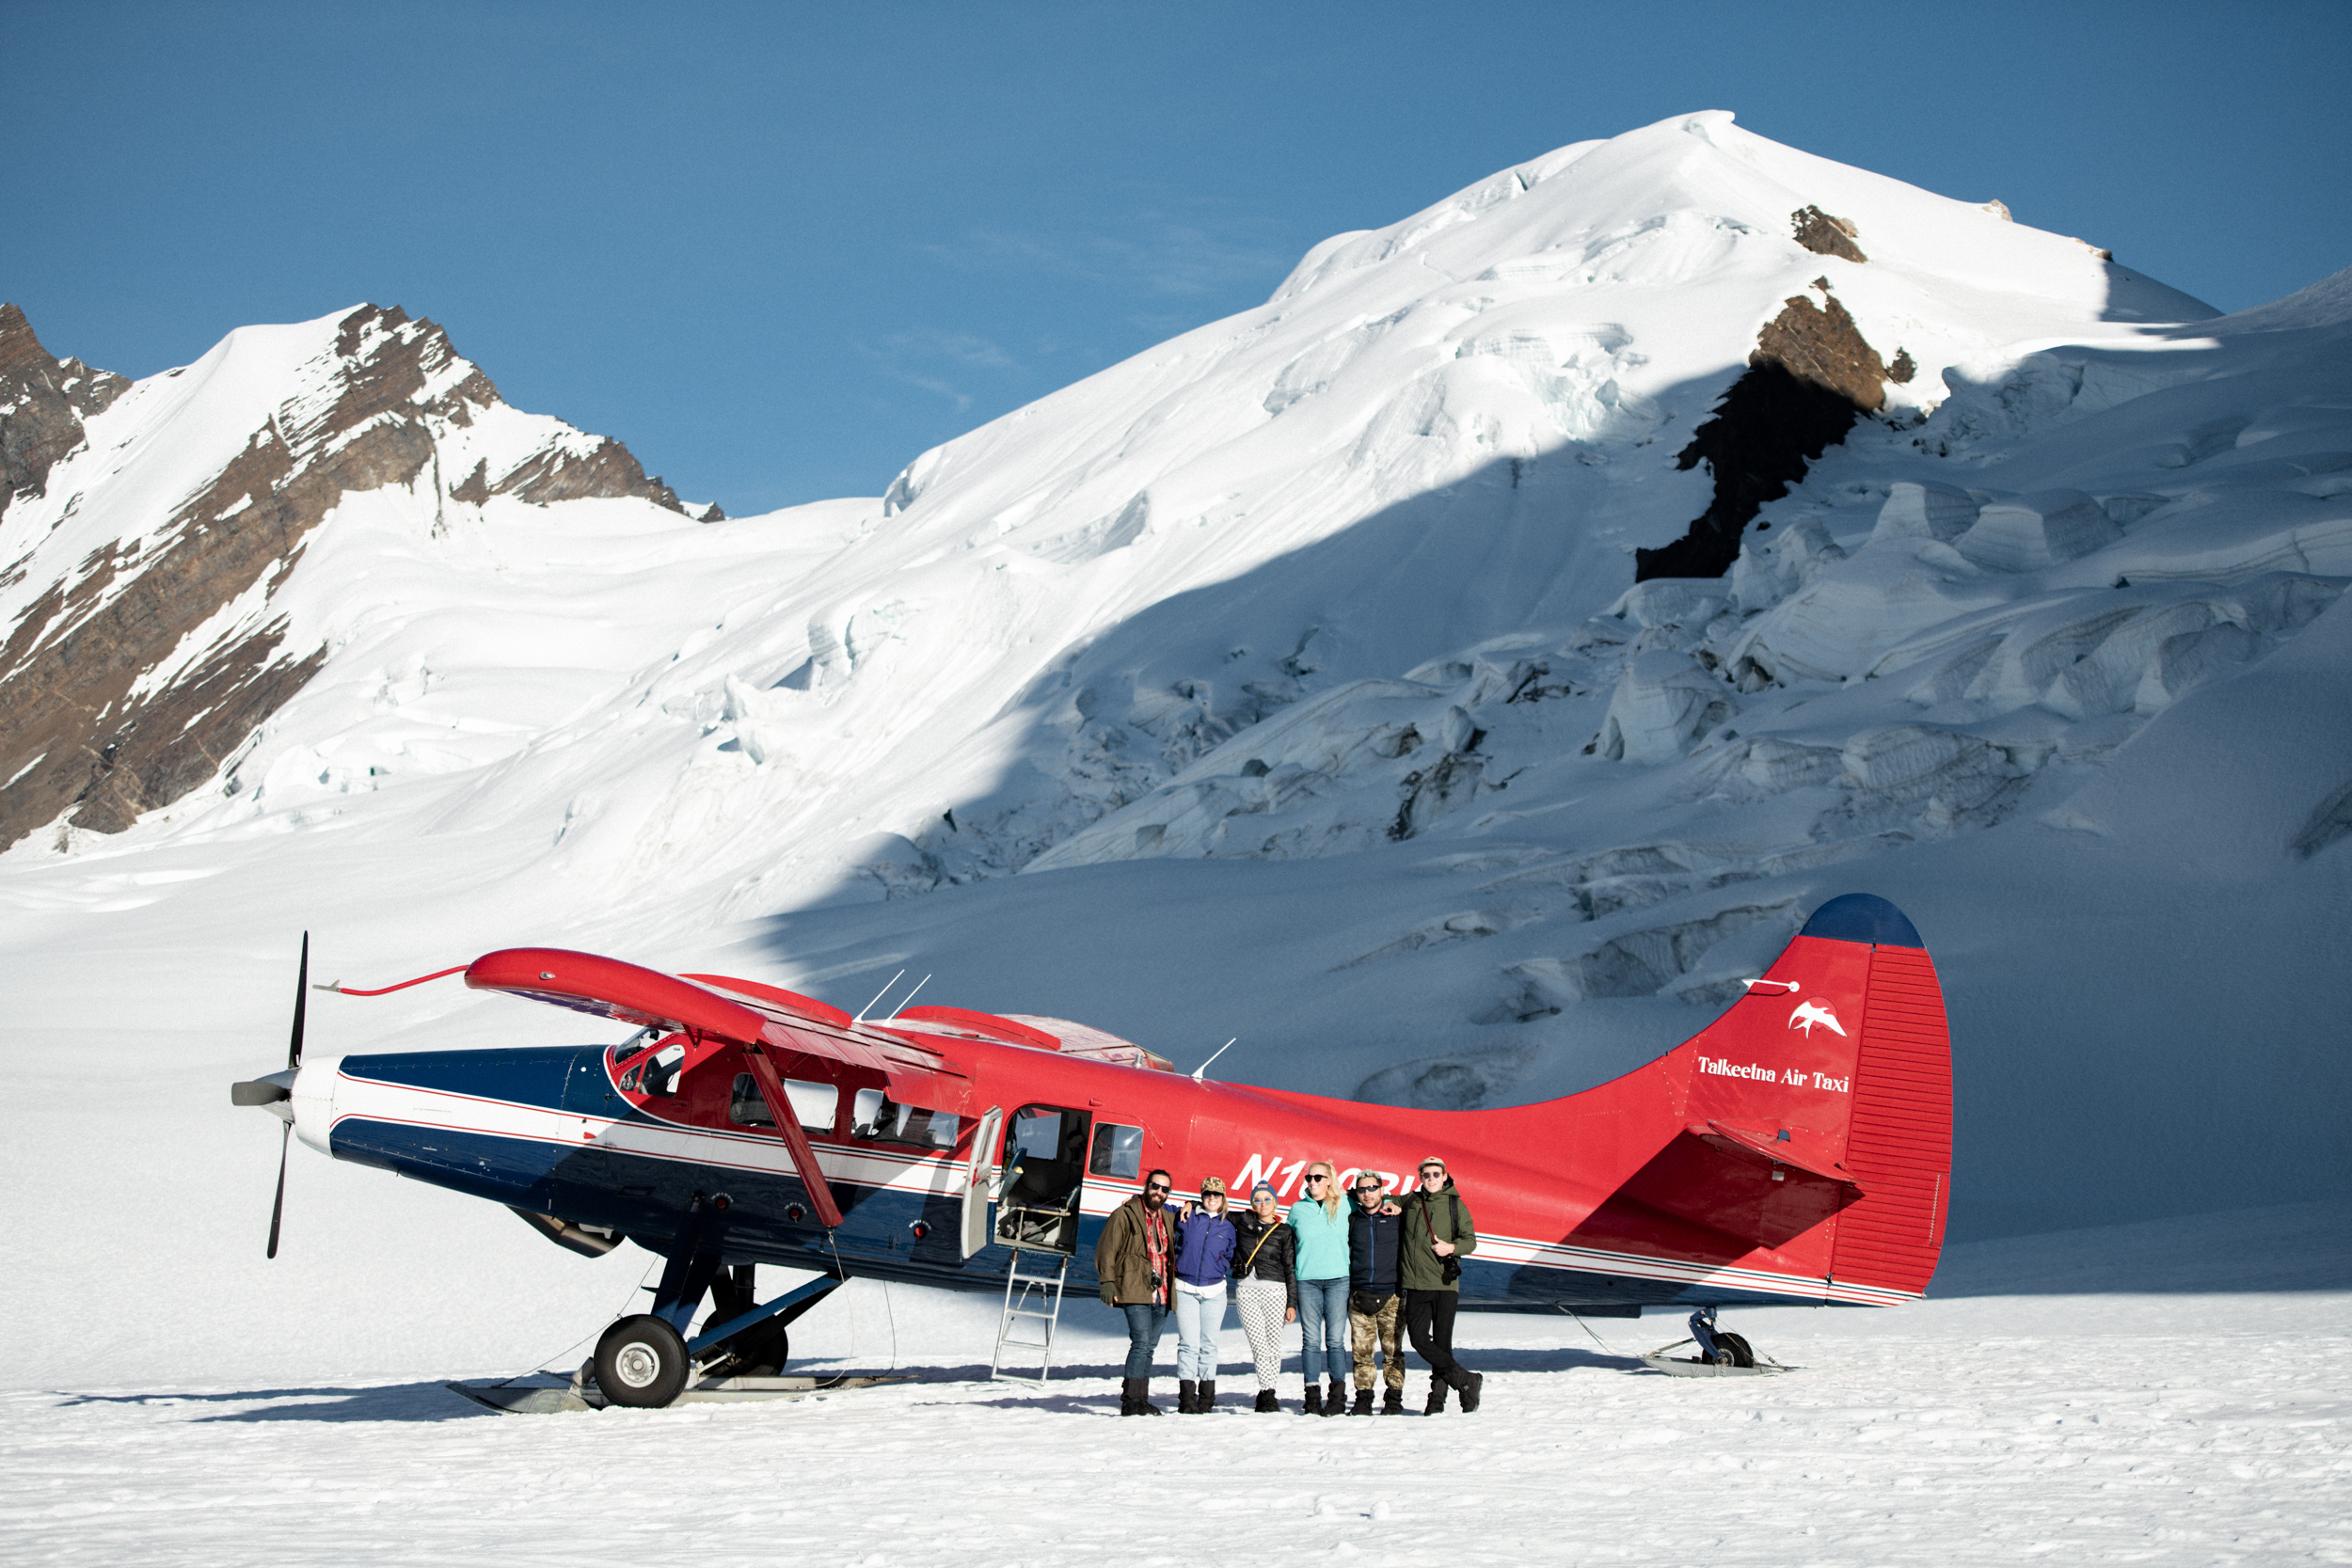 Glacier landing with friends!